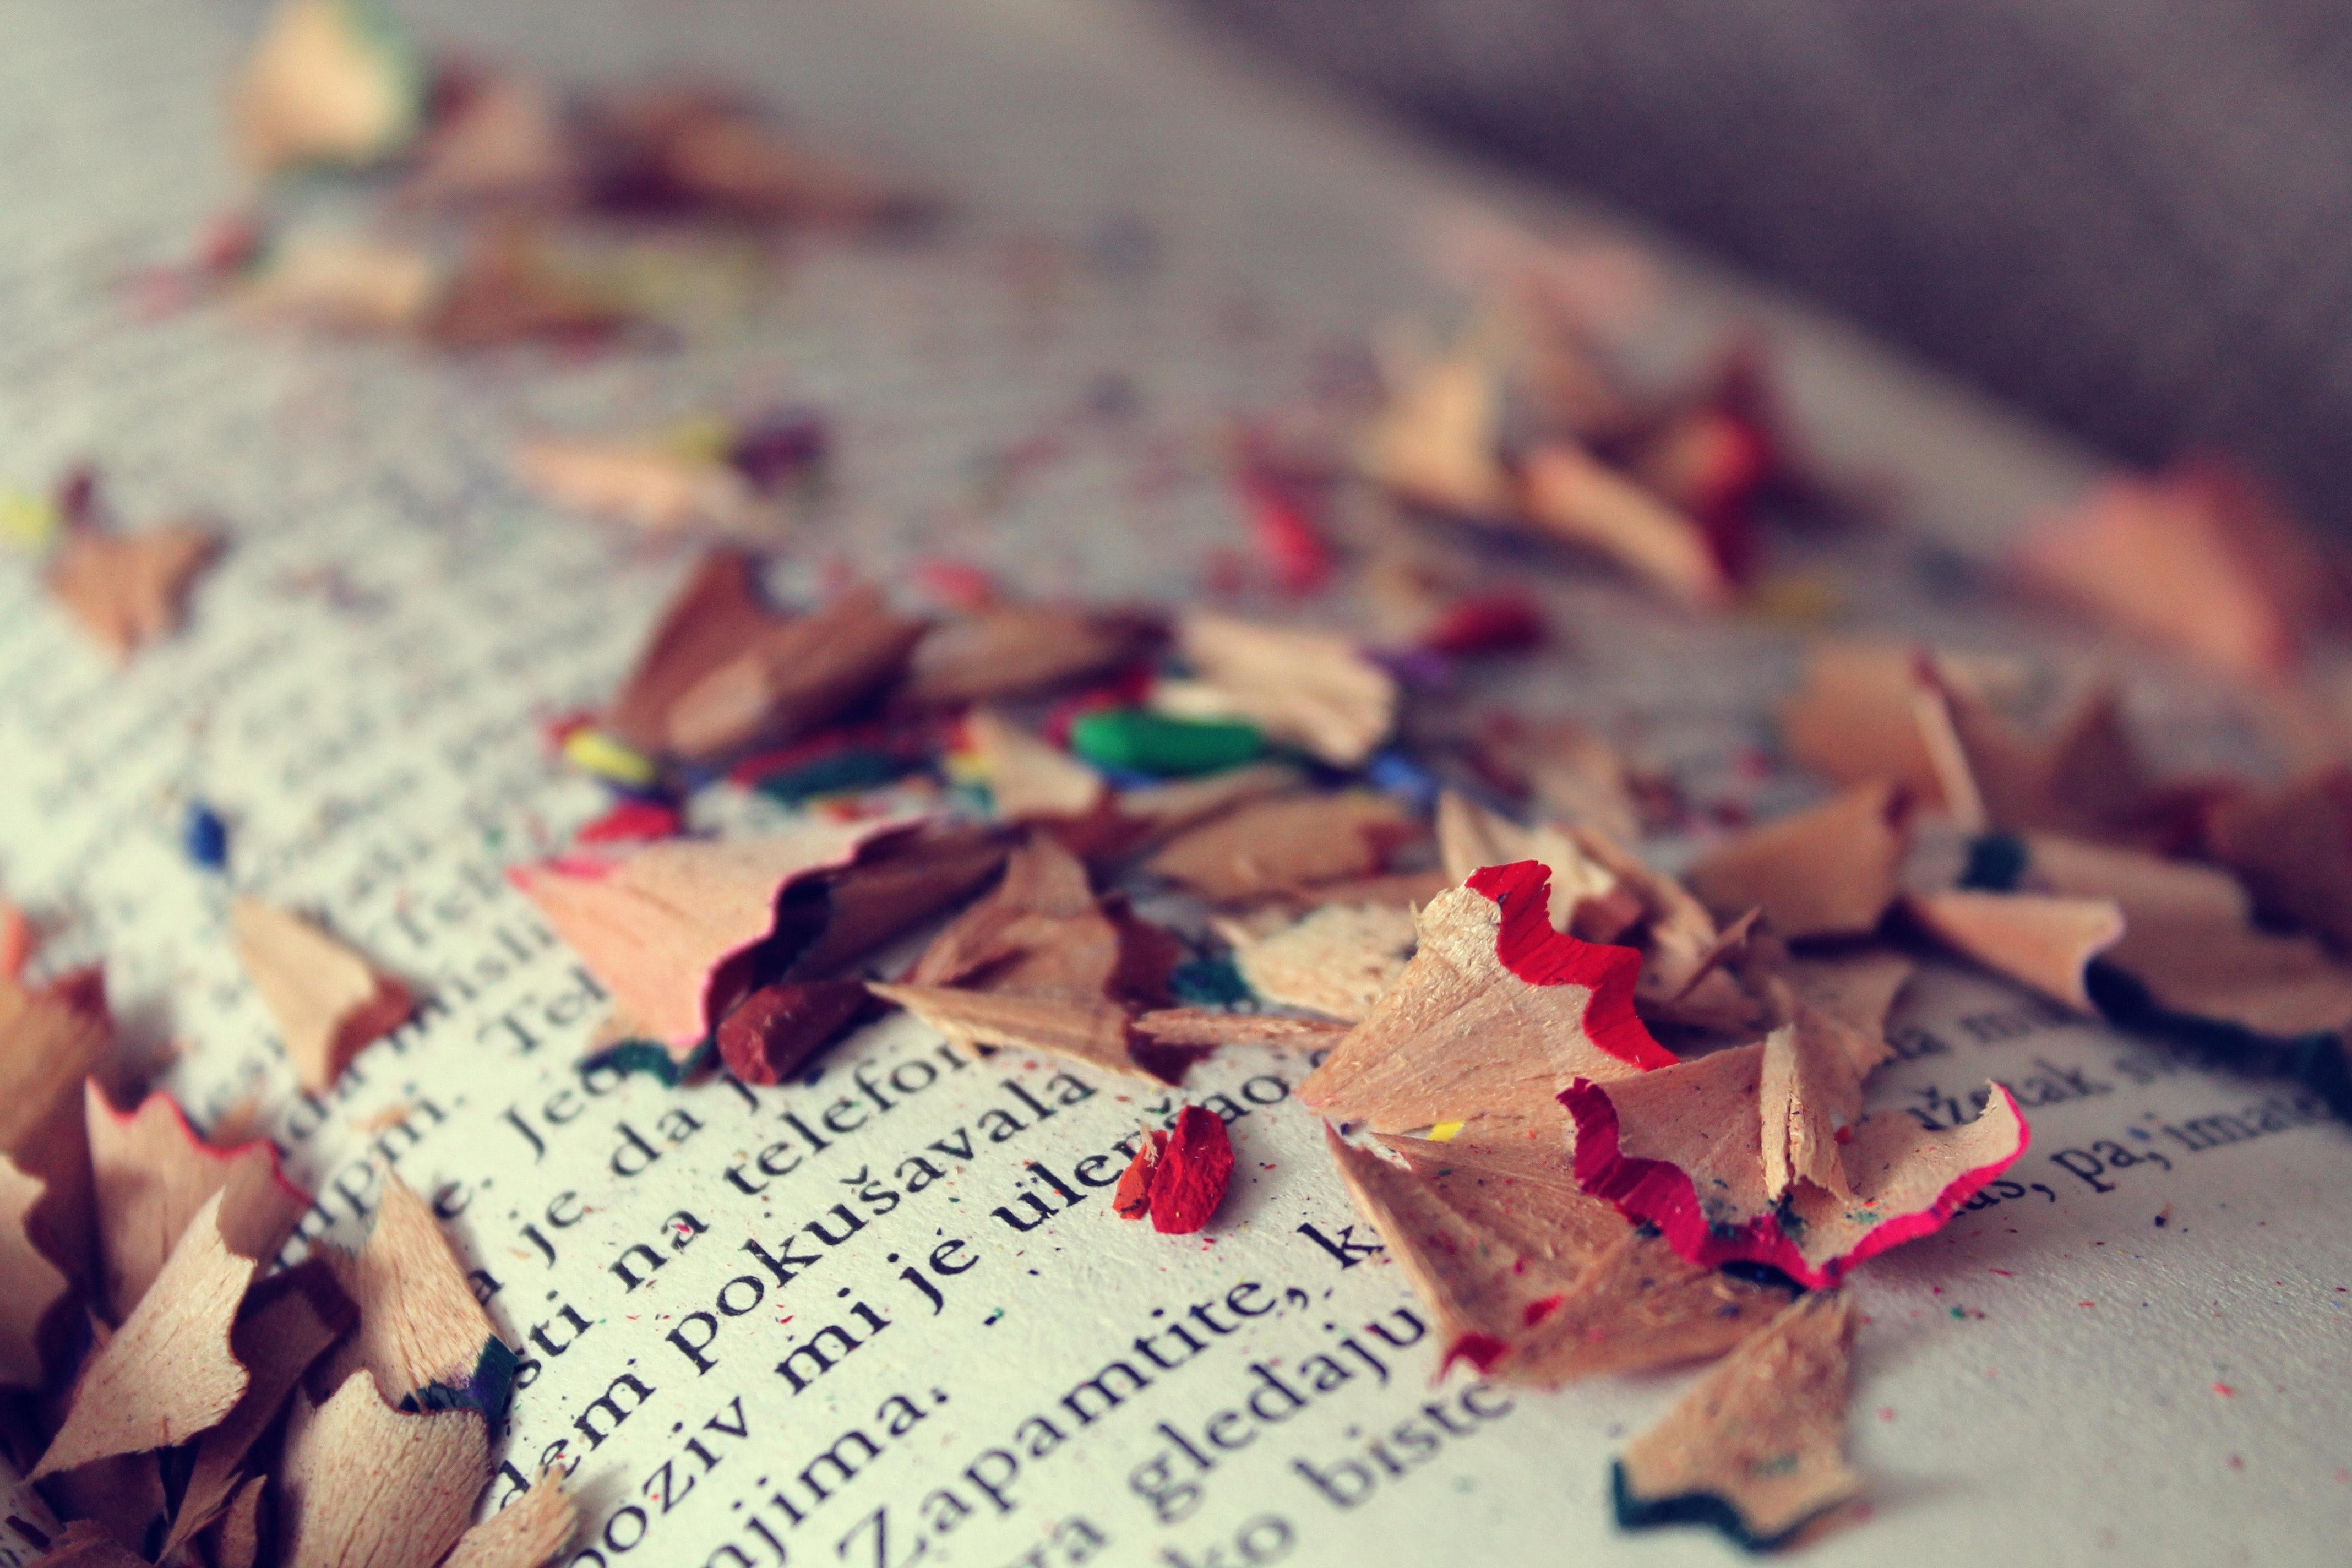 Free Images : art, blur, book, books, business, color, colors